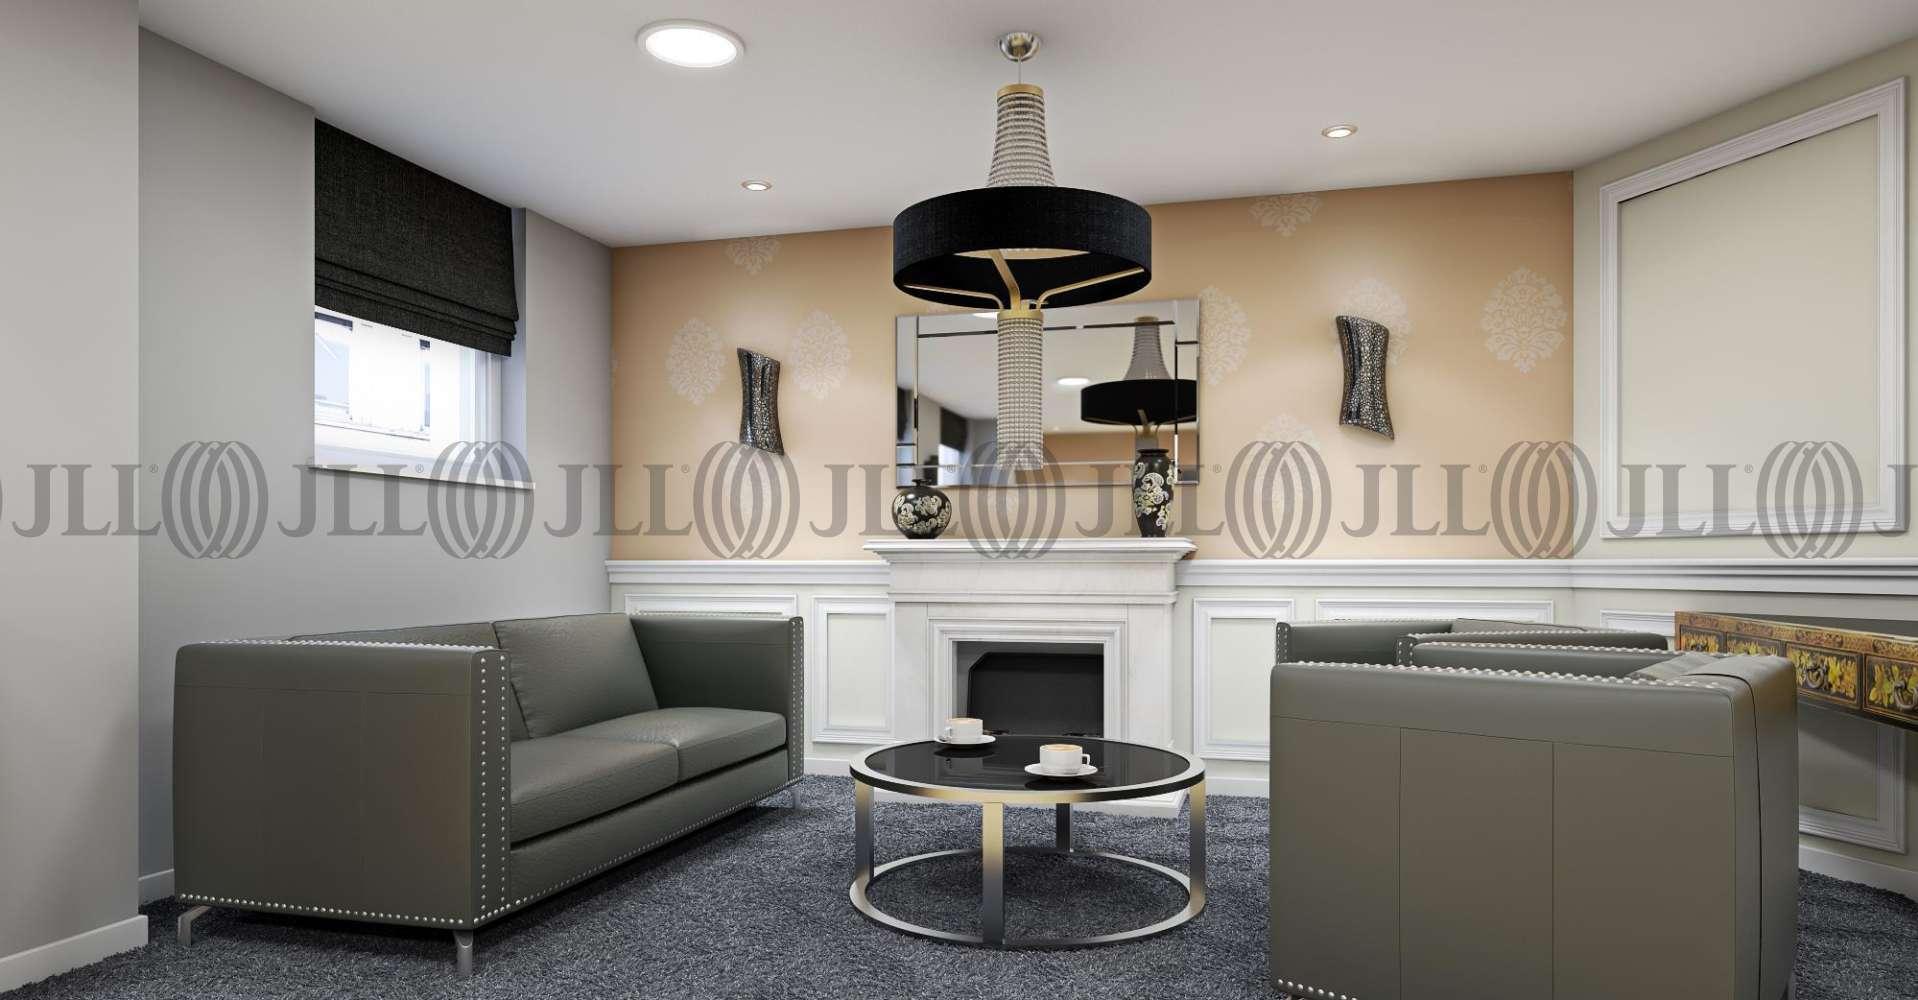 Serviced office London, EC3M 7UH  - Finsbury House  - 3